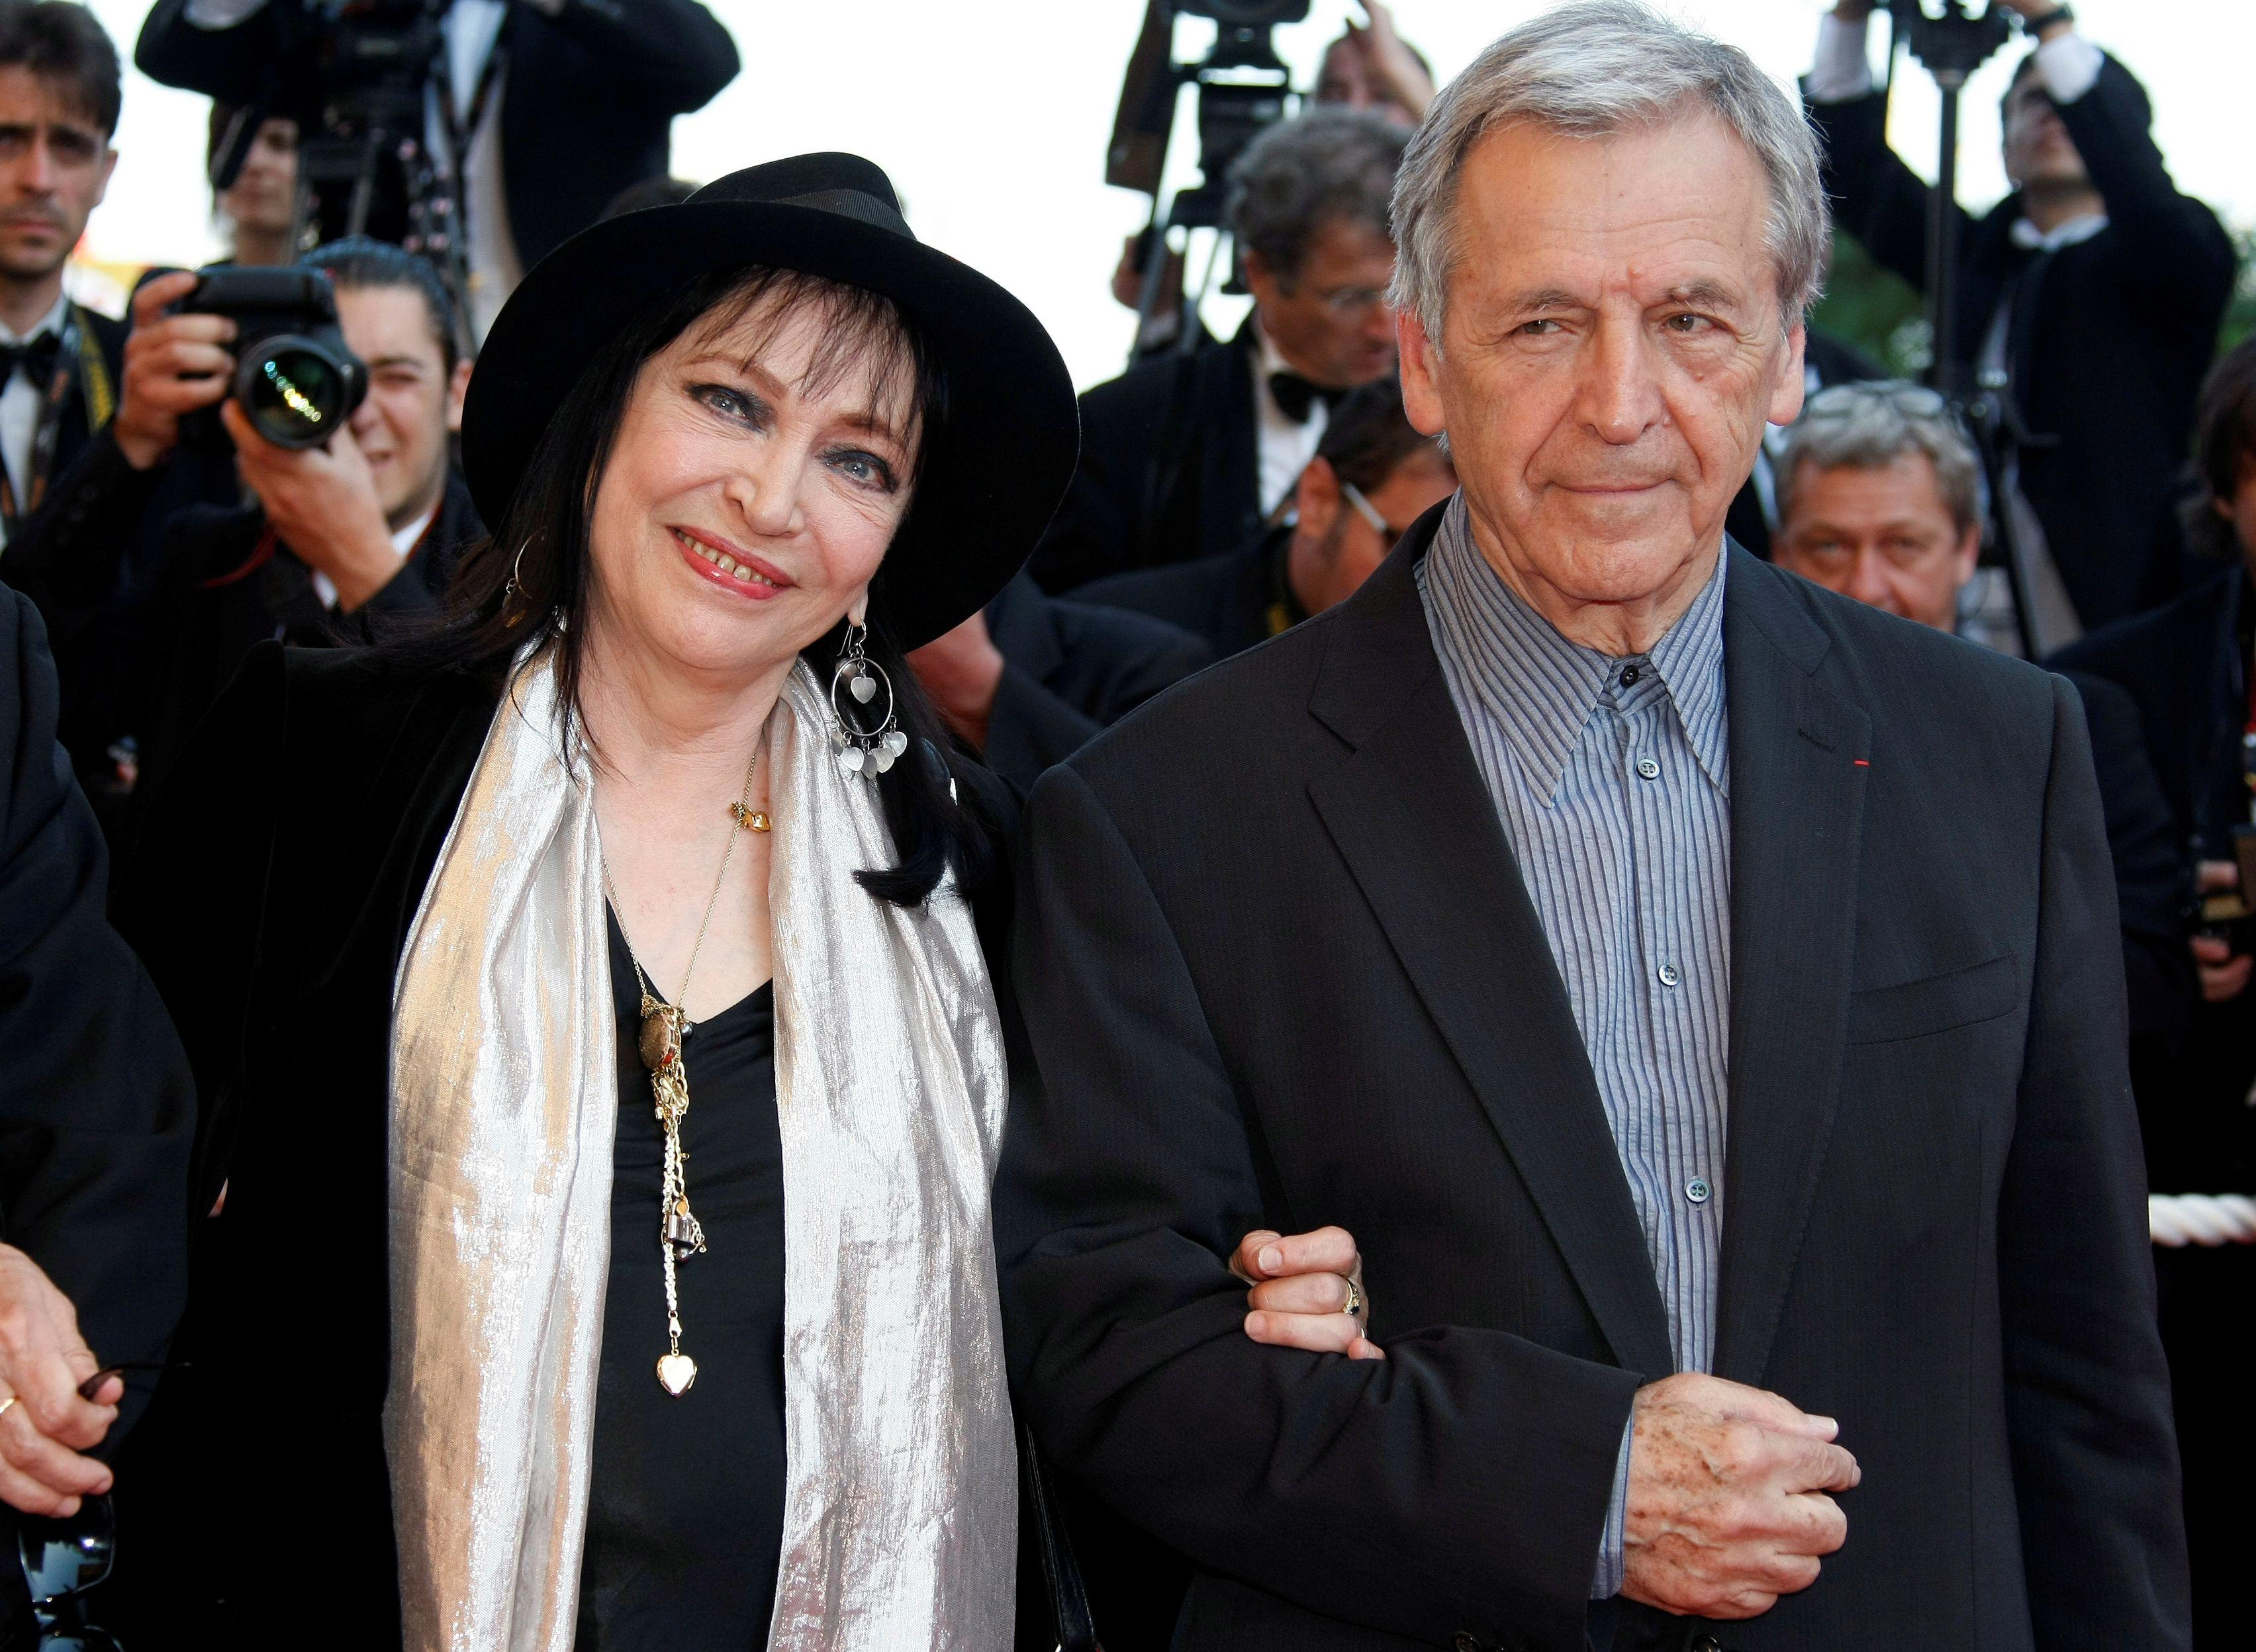 French New Wave film legend Anna Karina dies at 79